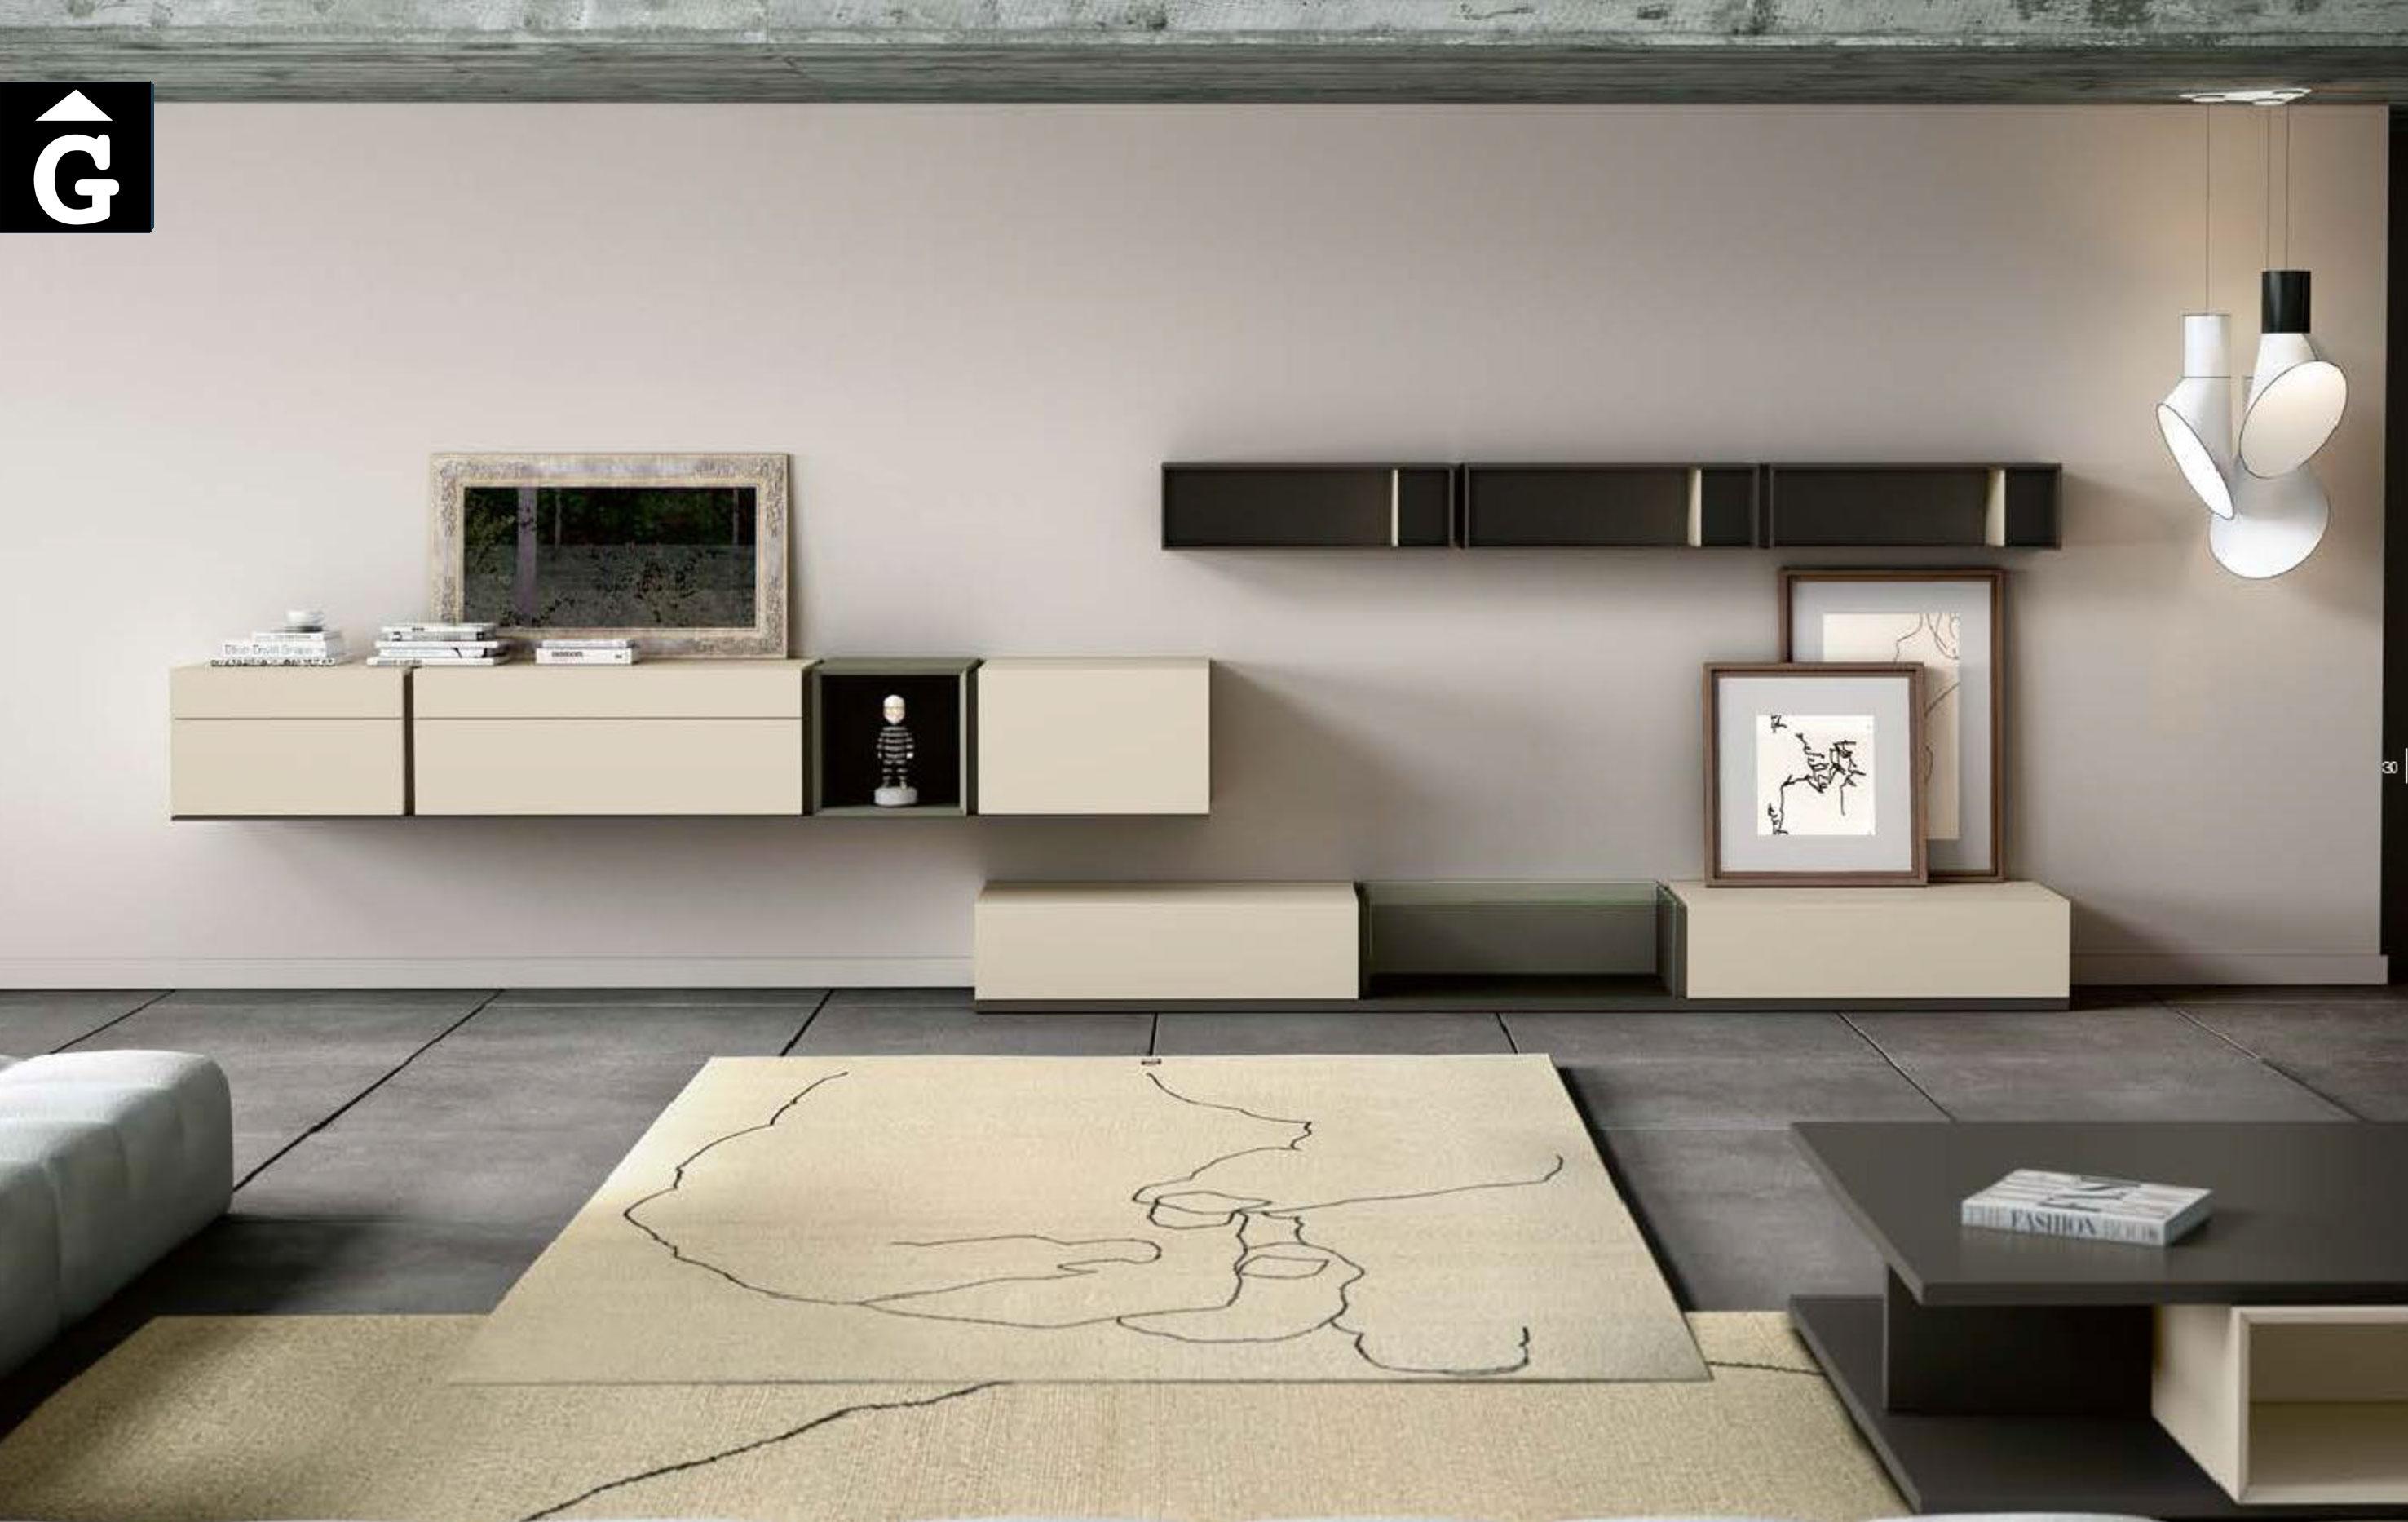 MOBLE-17-CONNECTOR-EMEDE-mobles-by-Mobles-GIFREU-Girona-ESPAI-EMEDE-Epacio-emede-Muebles-MD-moble-menjador-Sala-estar-habitatge-qualitat-laca-xapa-natural